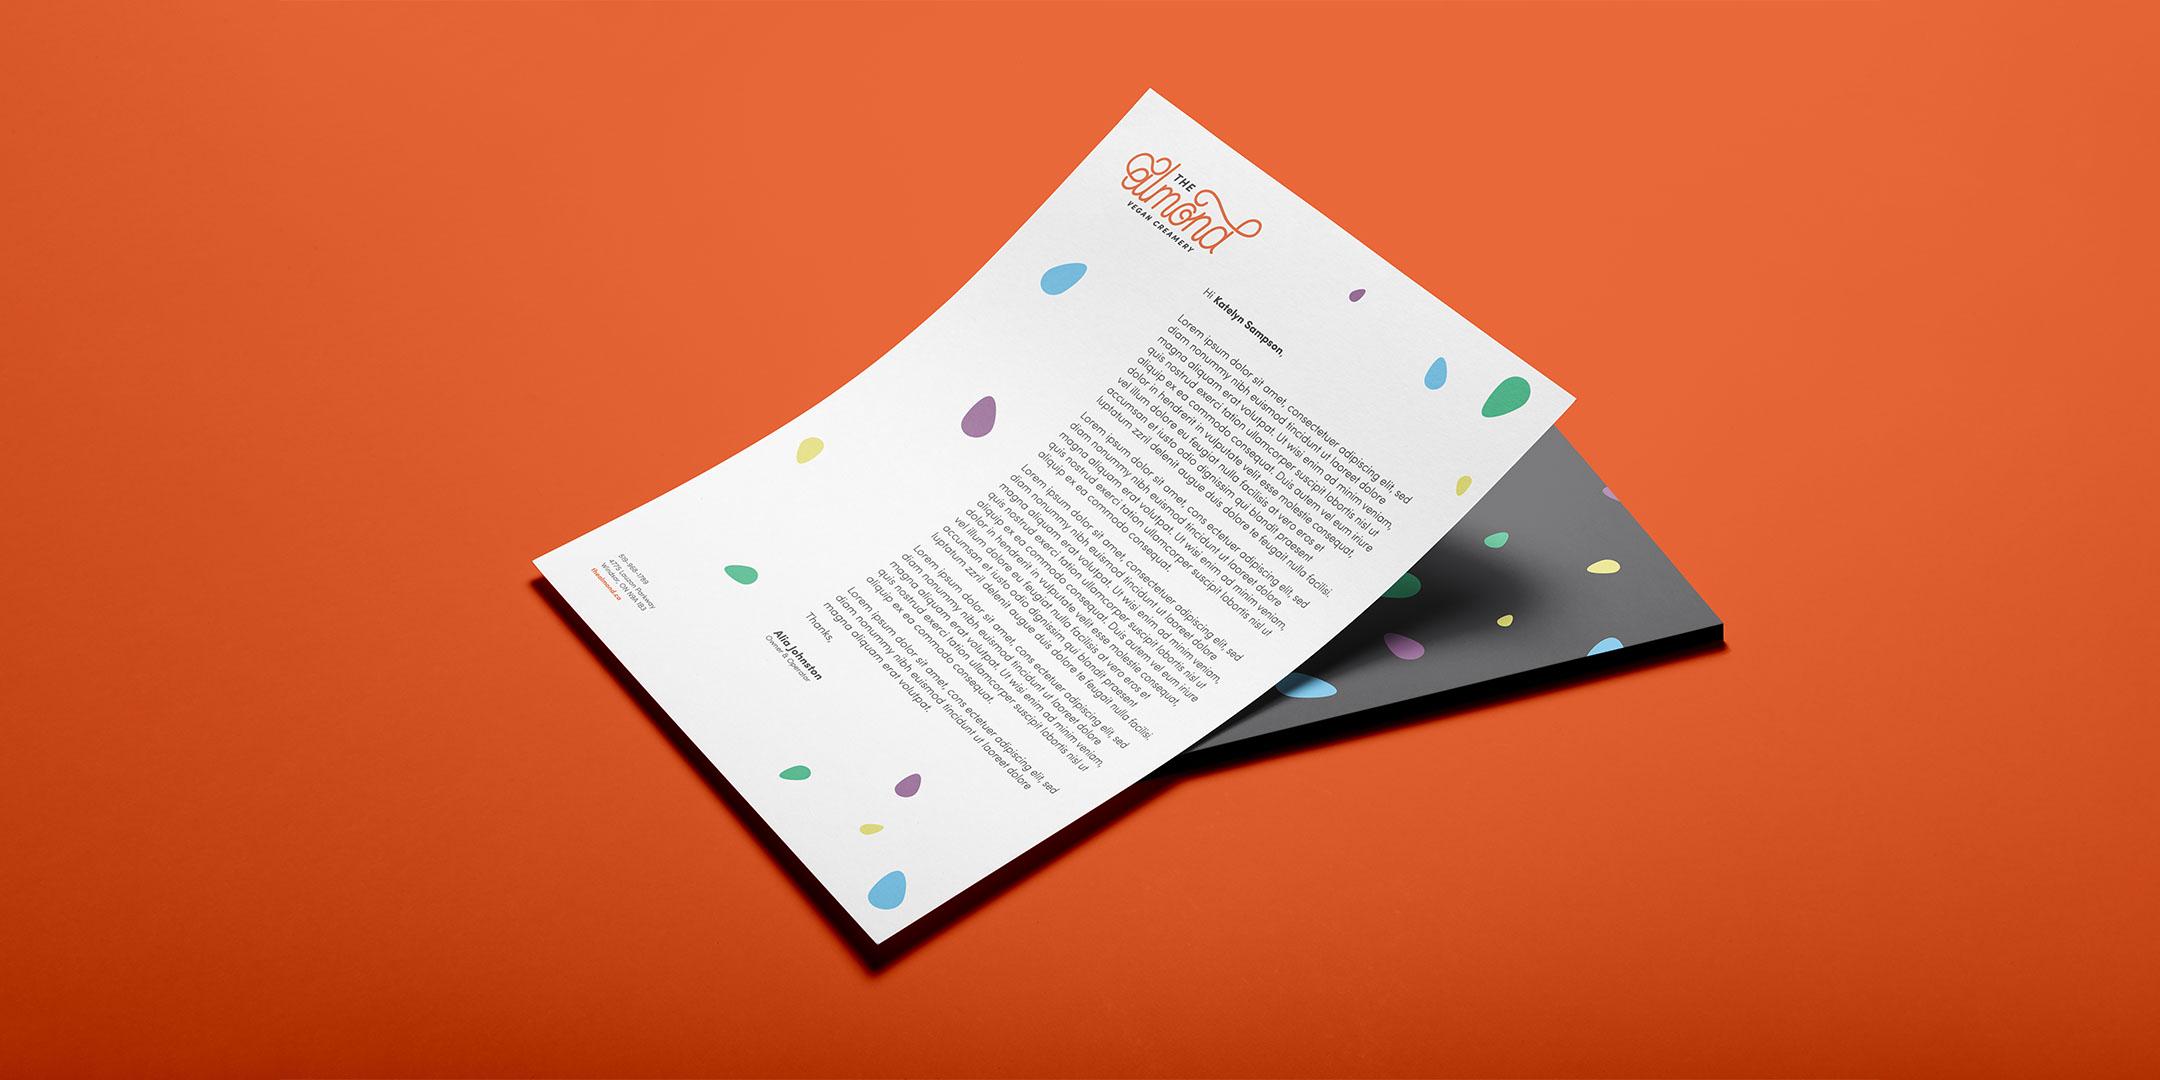 The Almond letterhead